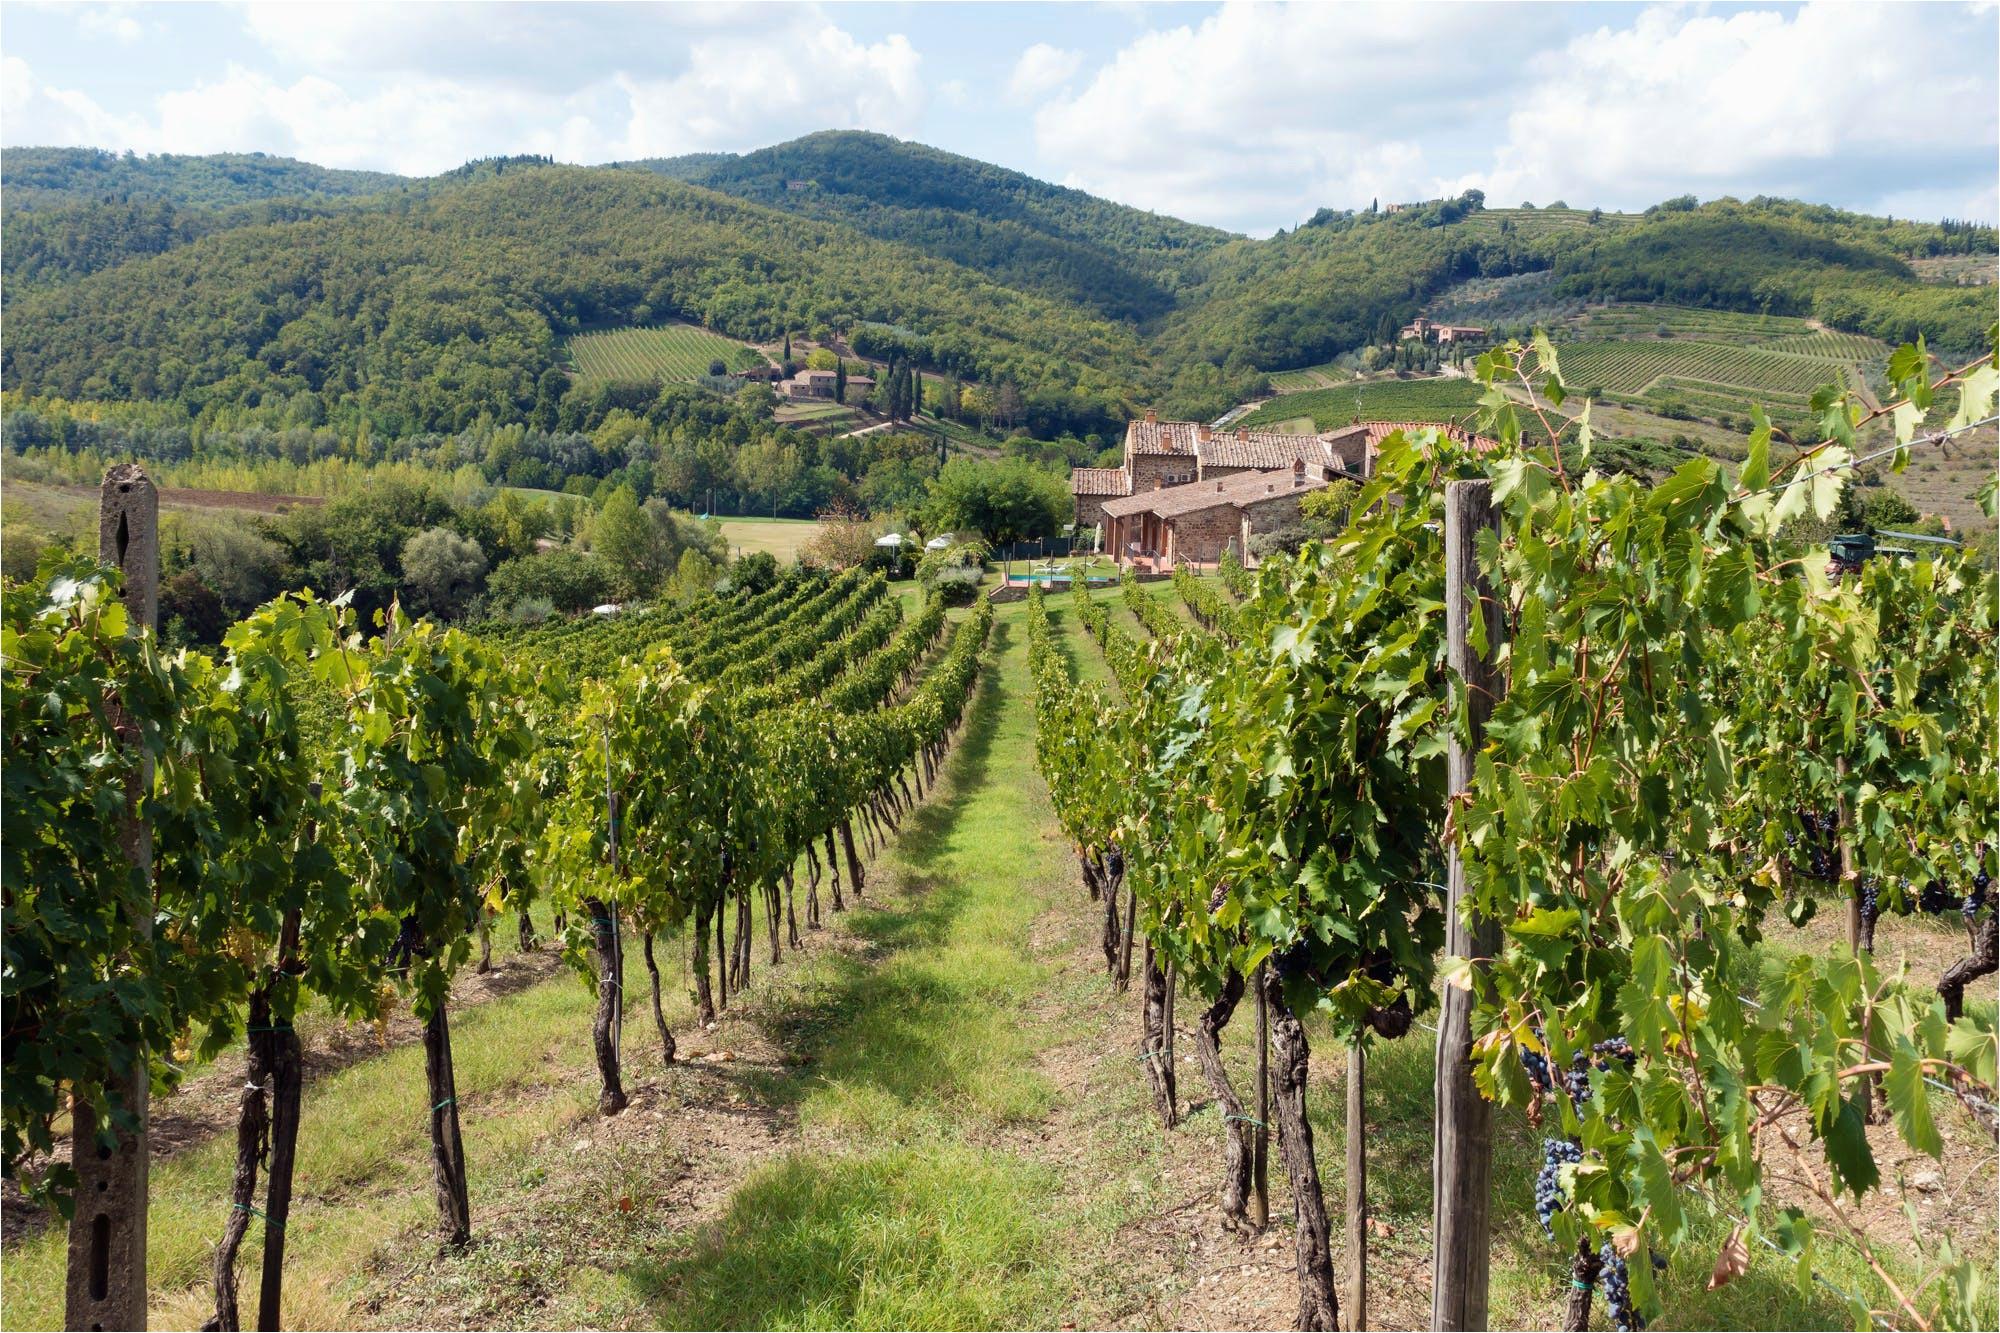 chianti italy travel guide to chianti wine region in tuscany italy